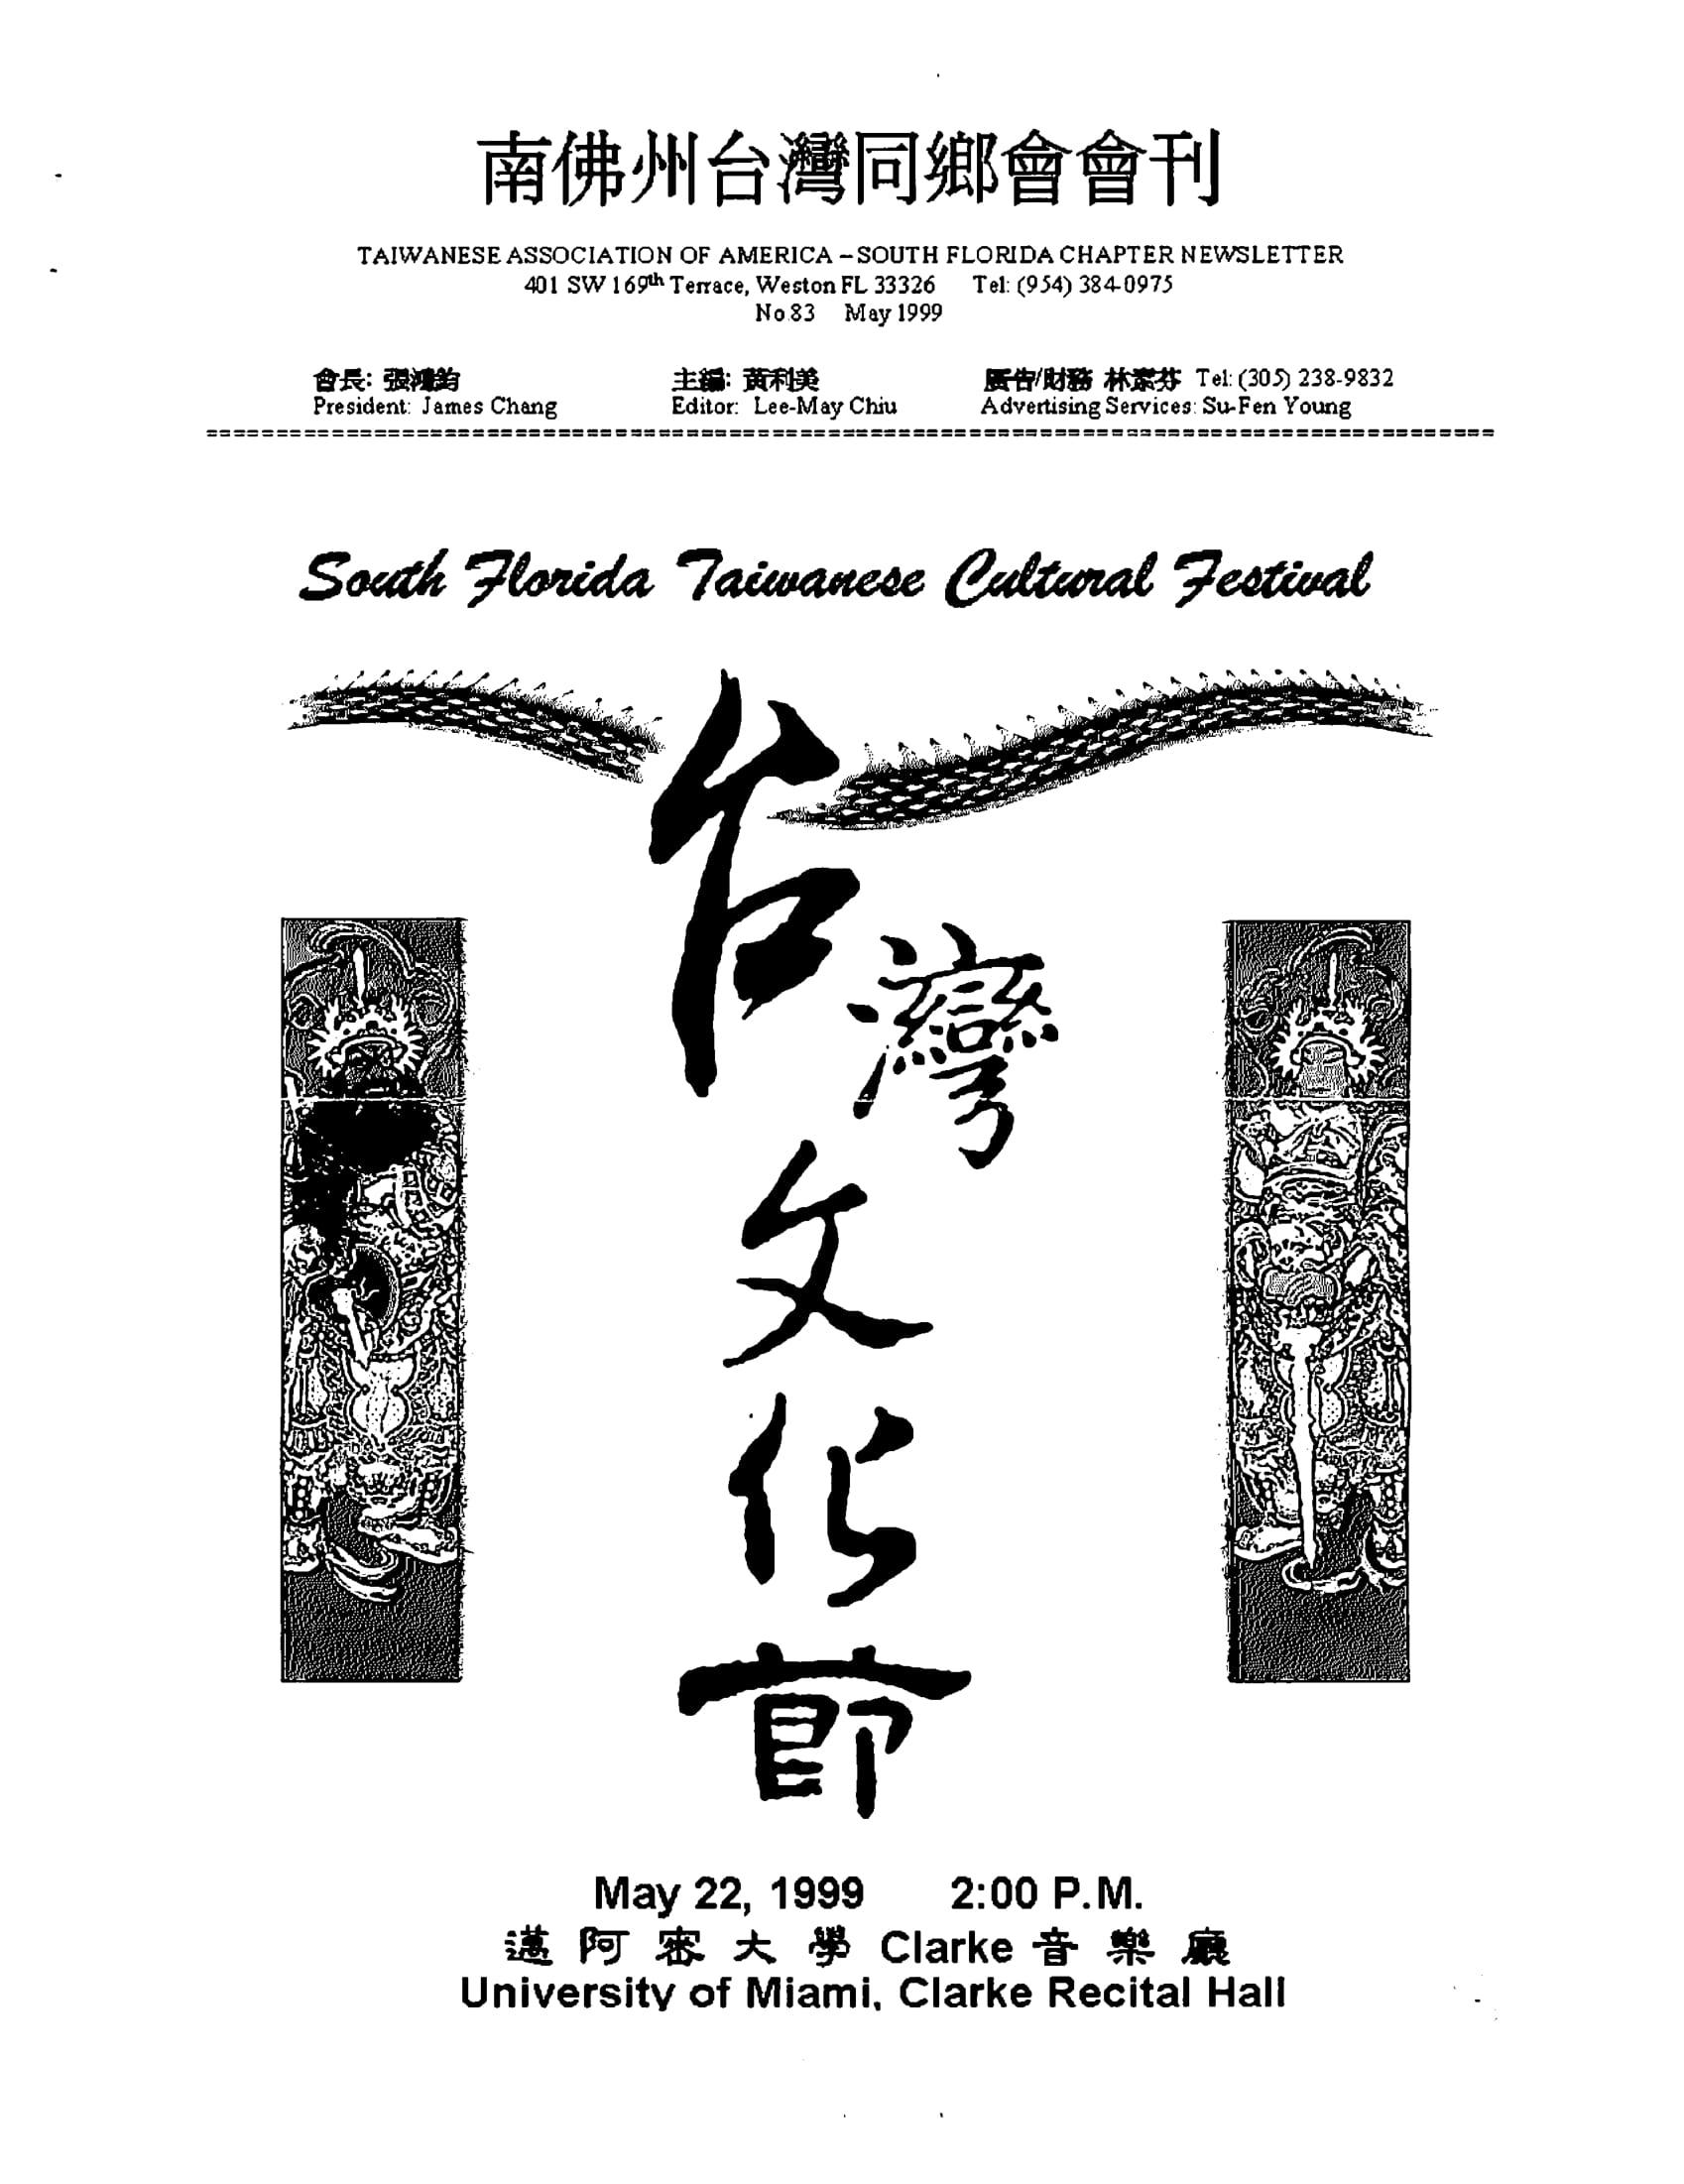 36. South Florida Taiwanese Cultural Festival/1999